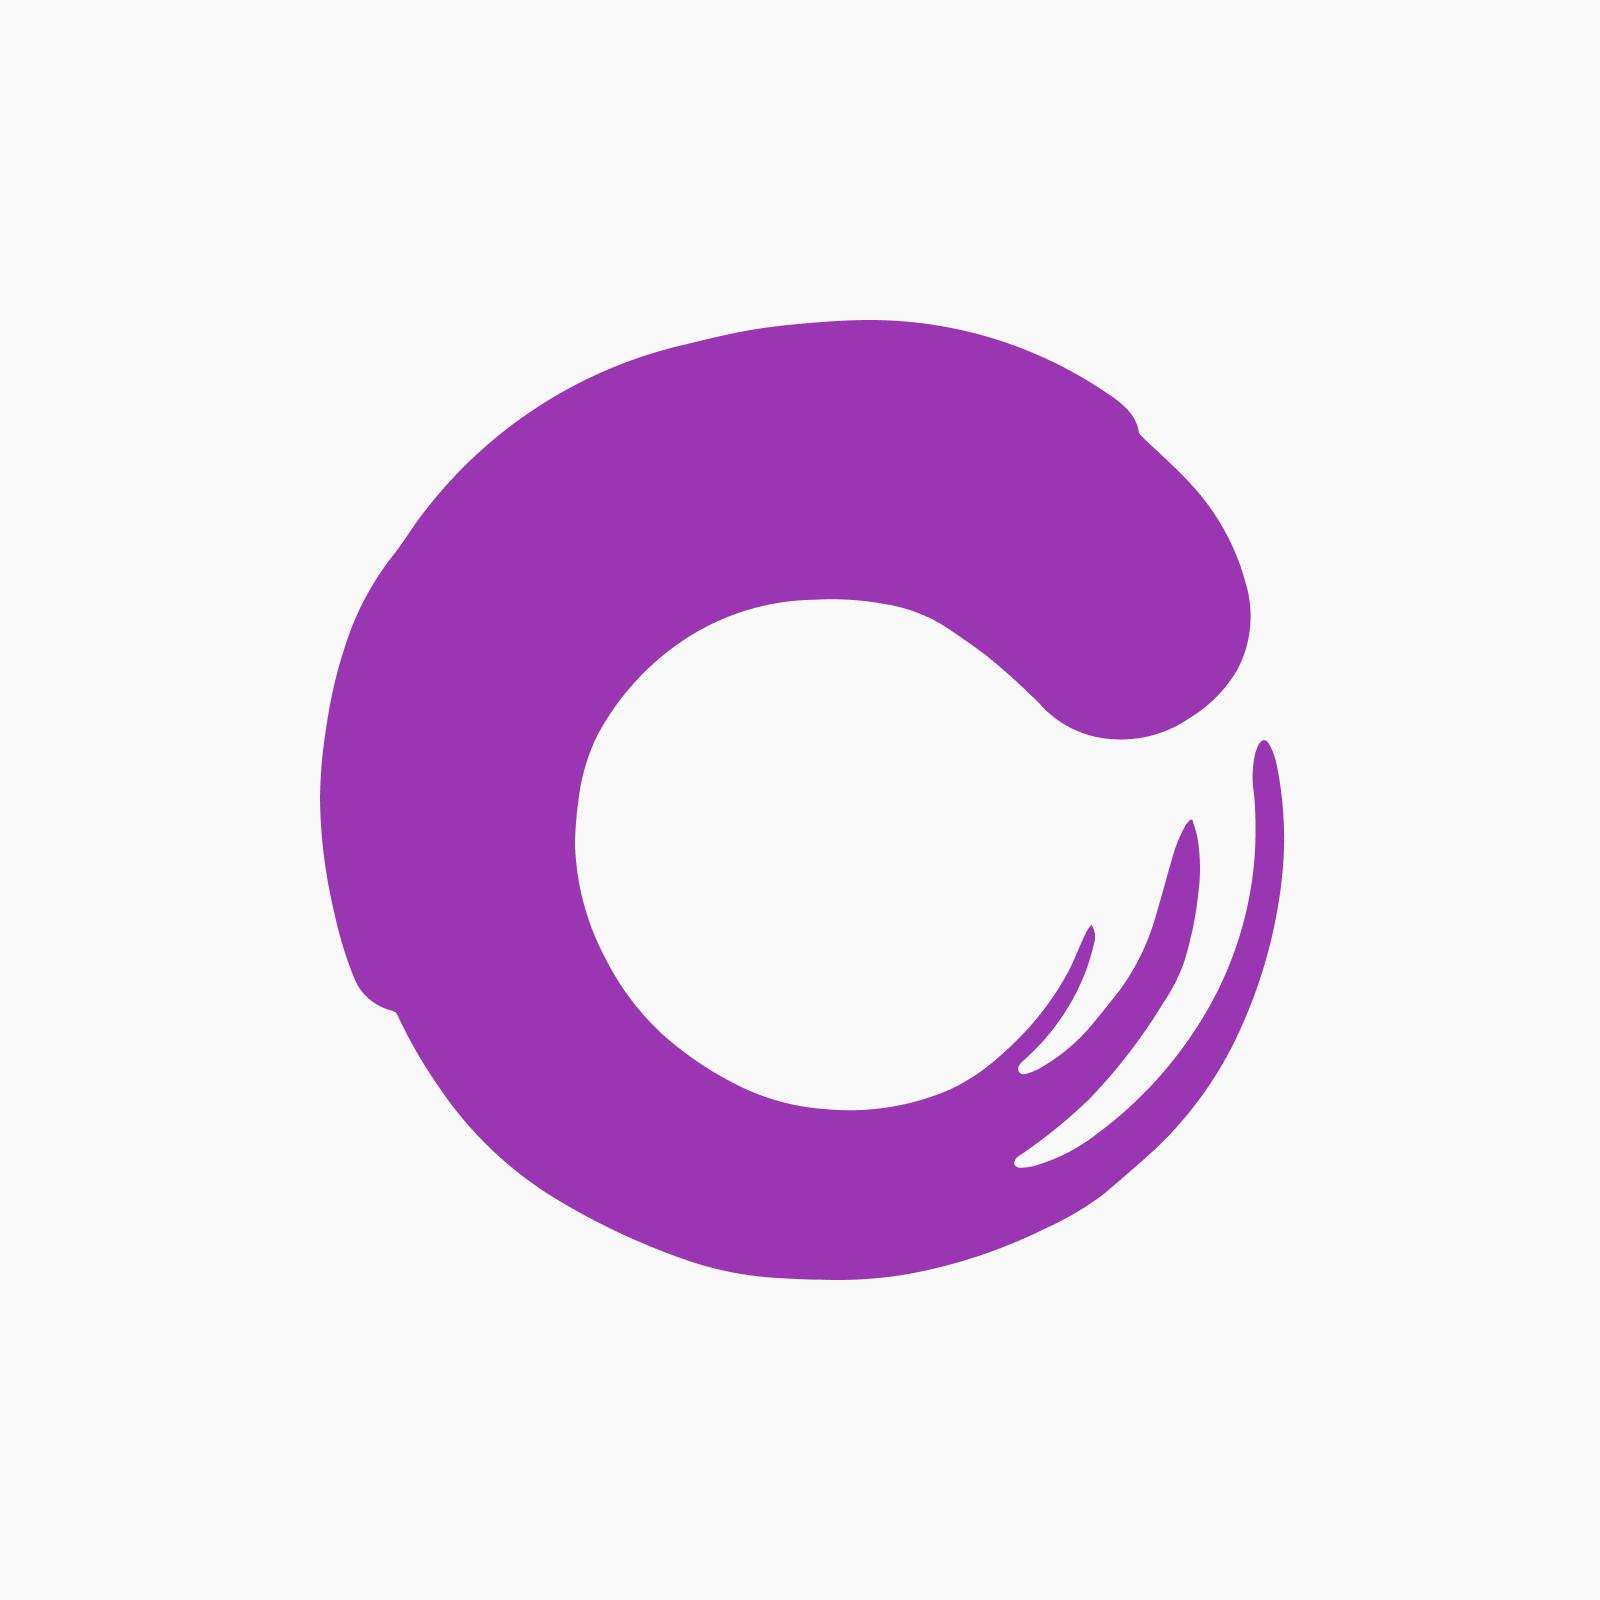 Culture Amp logo